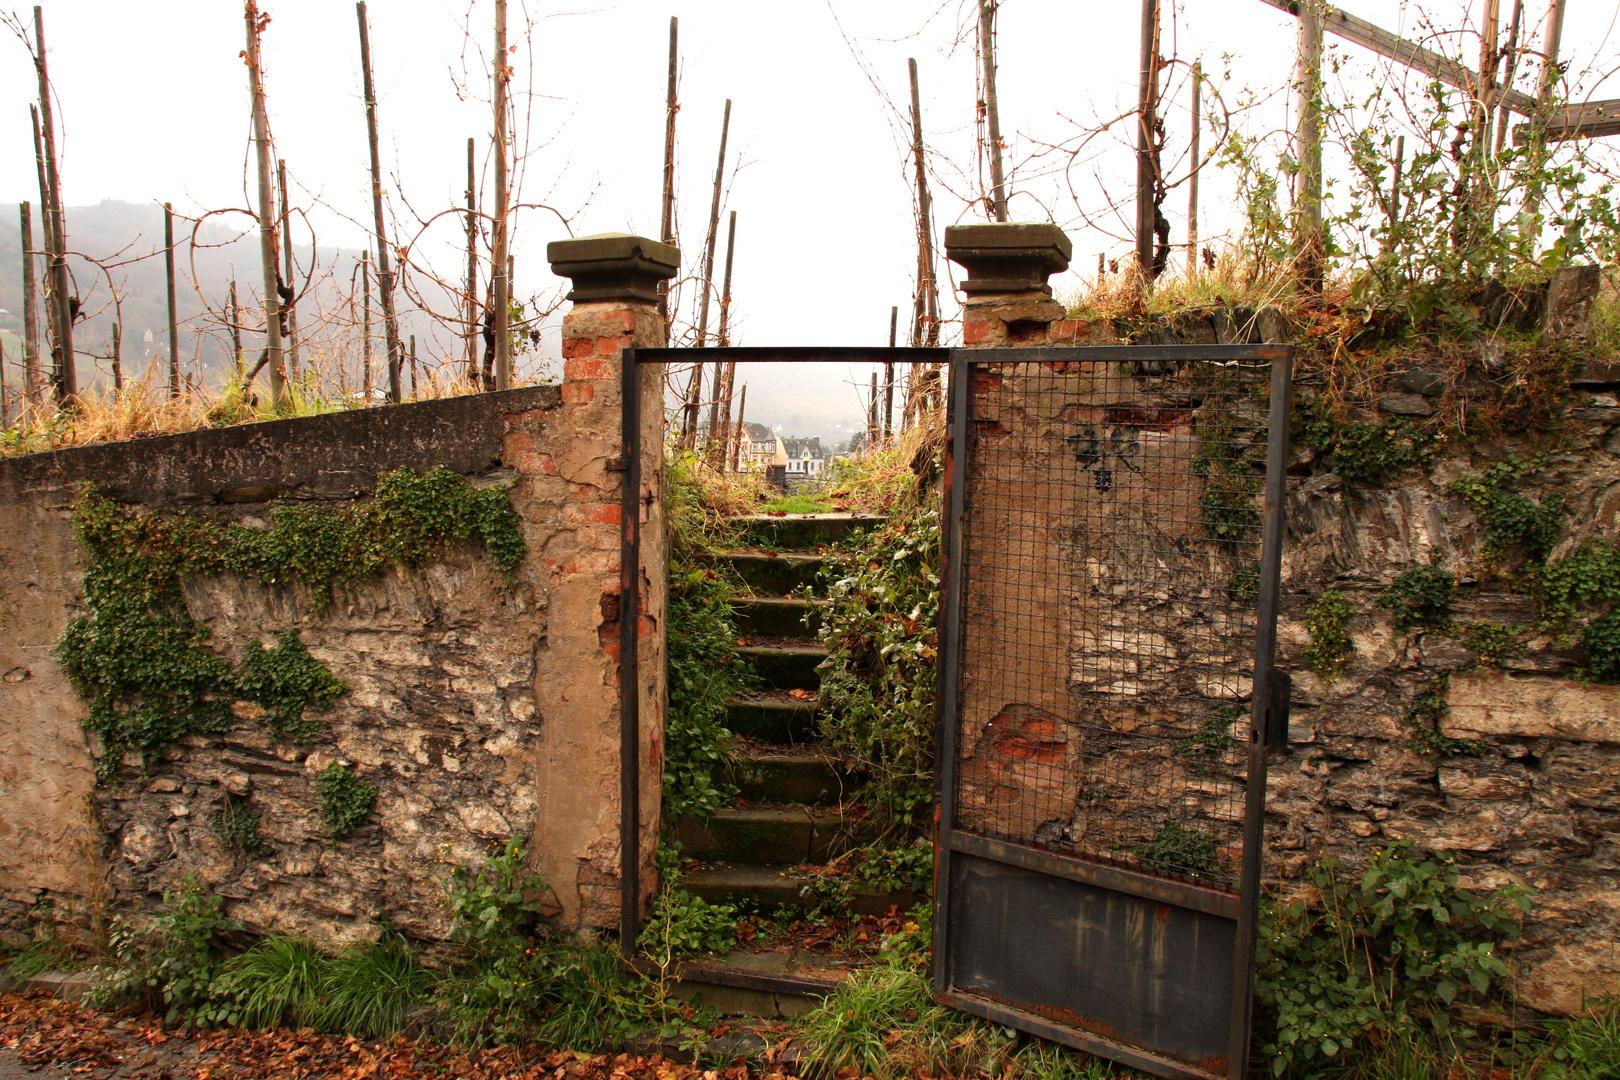 Entrance of a vineyard